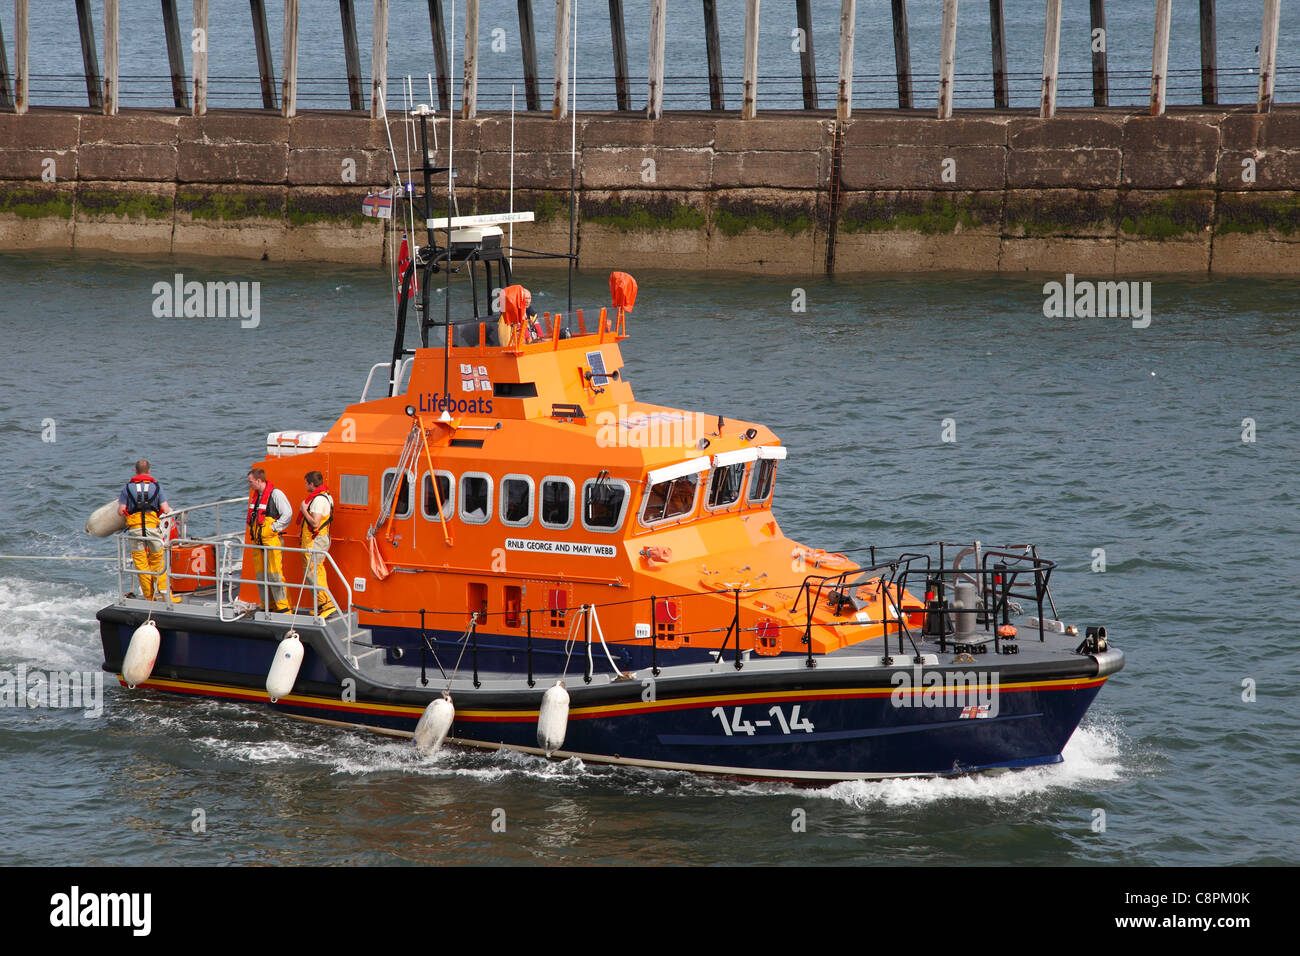 RNLI lifeboat 'George & Mary Webb'  Whitby, North Yorkshire, England, U.K. Stock Photo